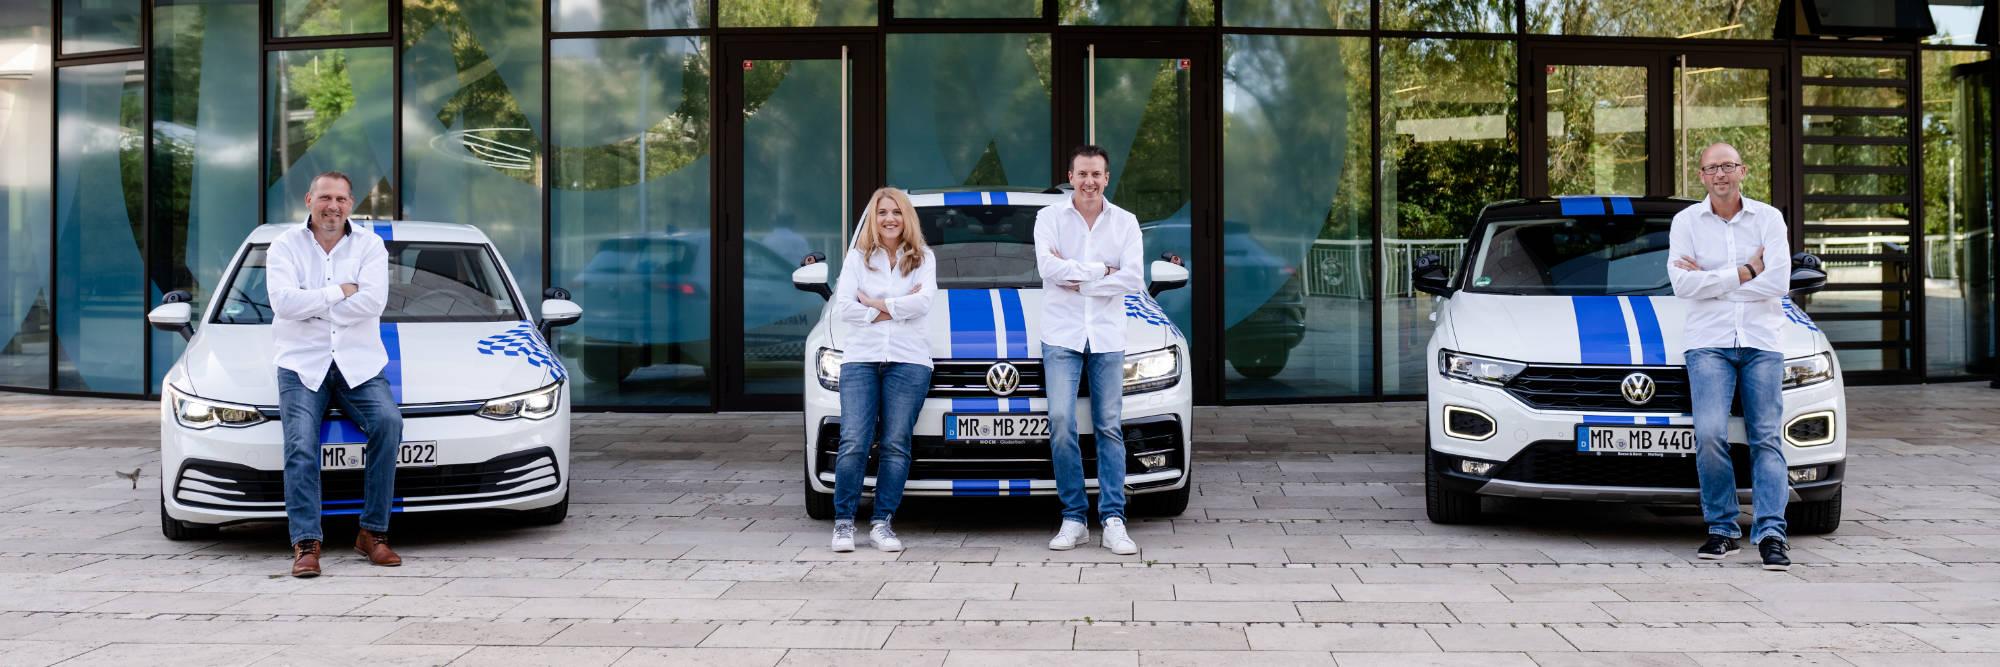 Team der Fahrschule Marcel Baumann aus Marburg